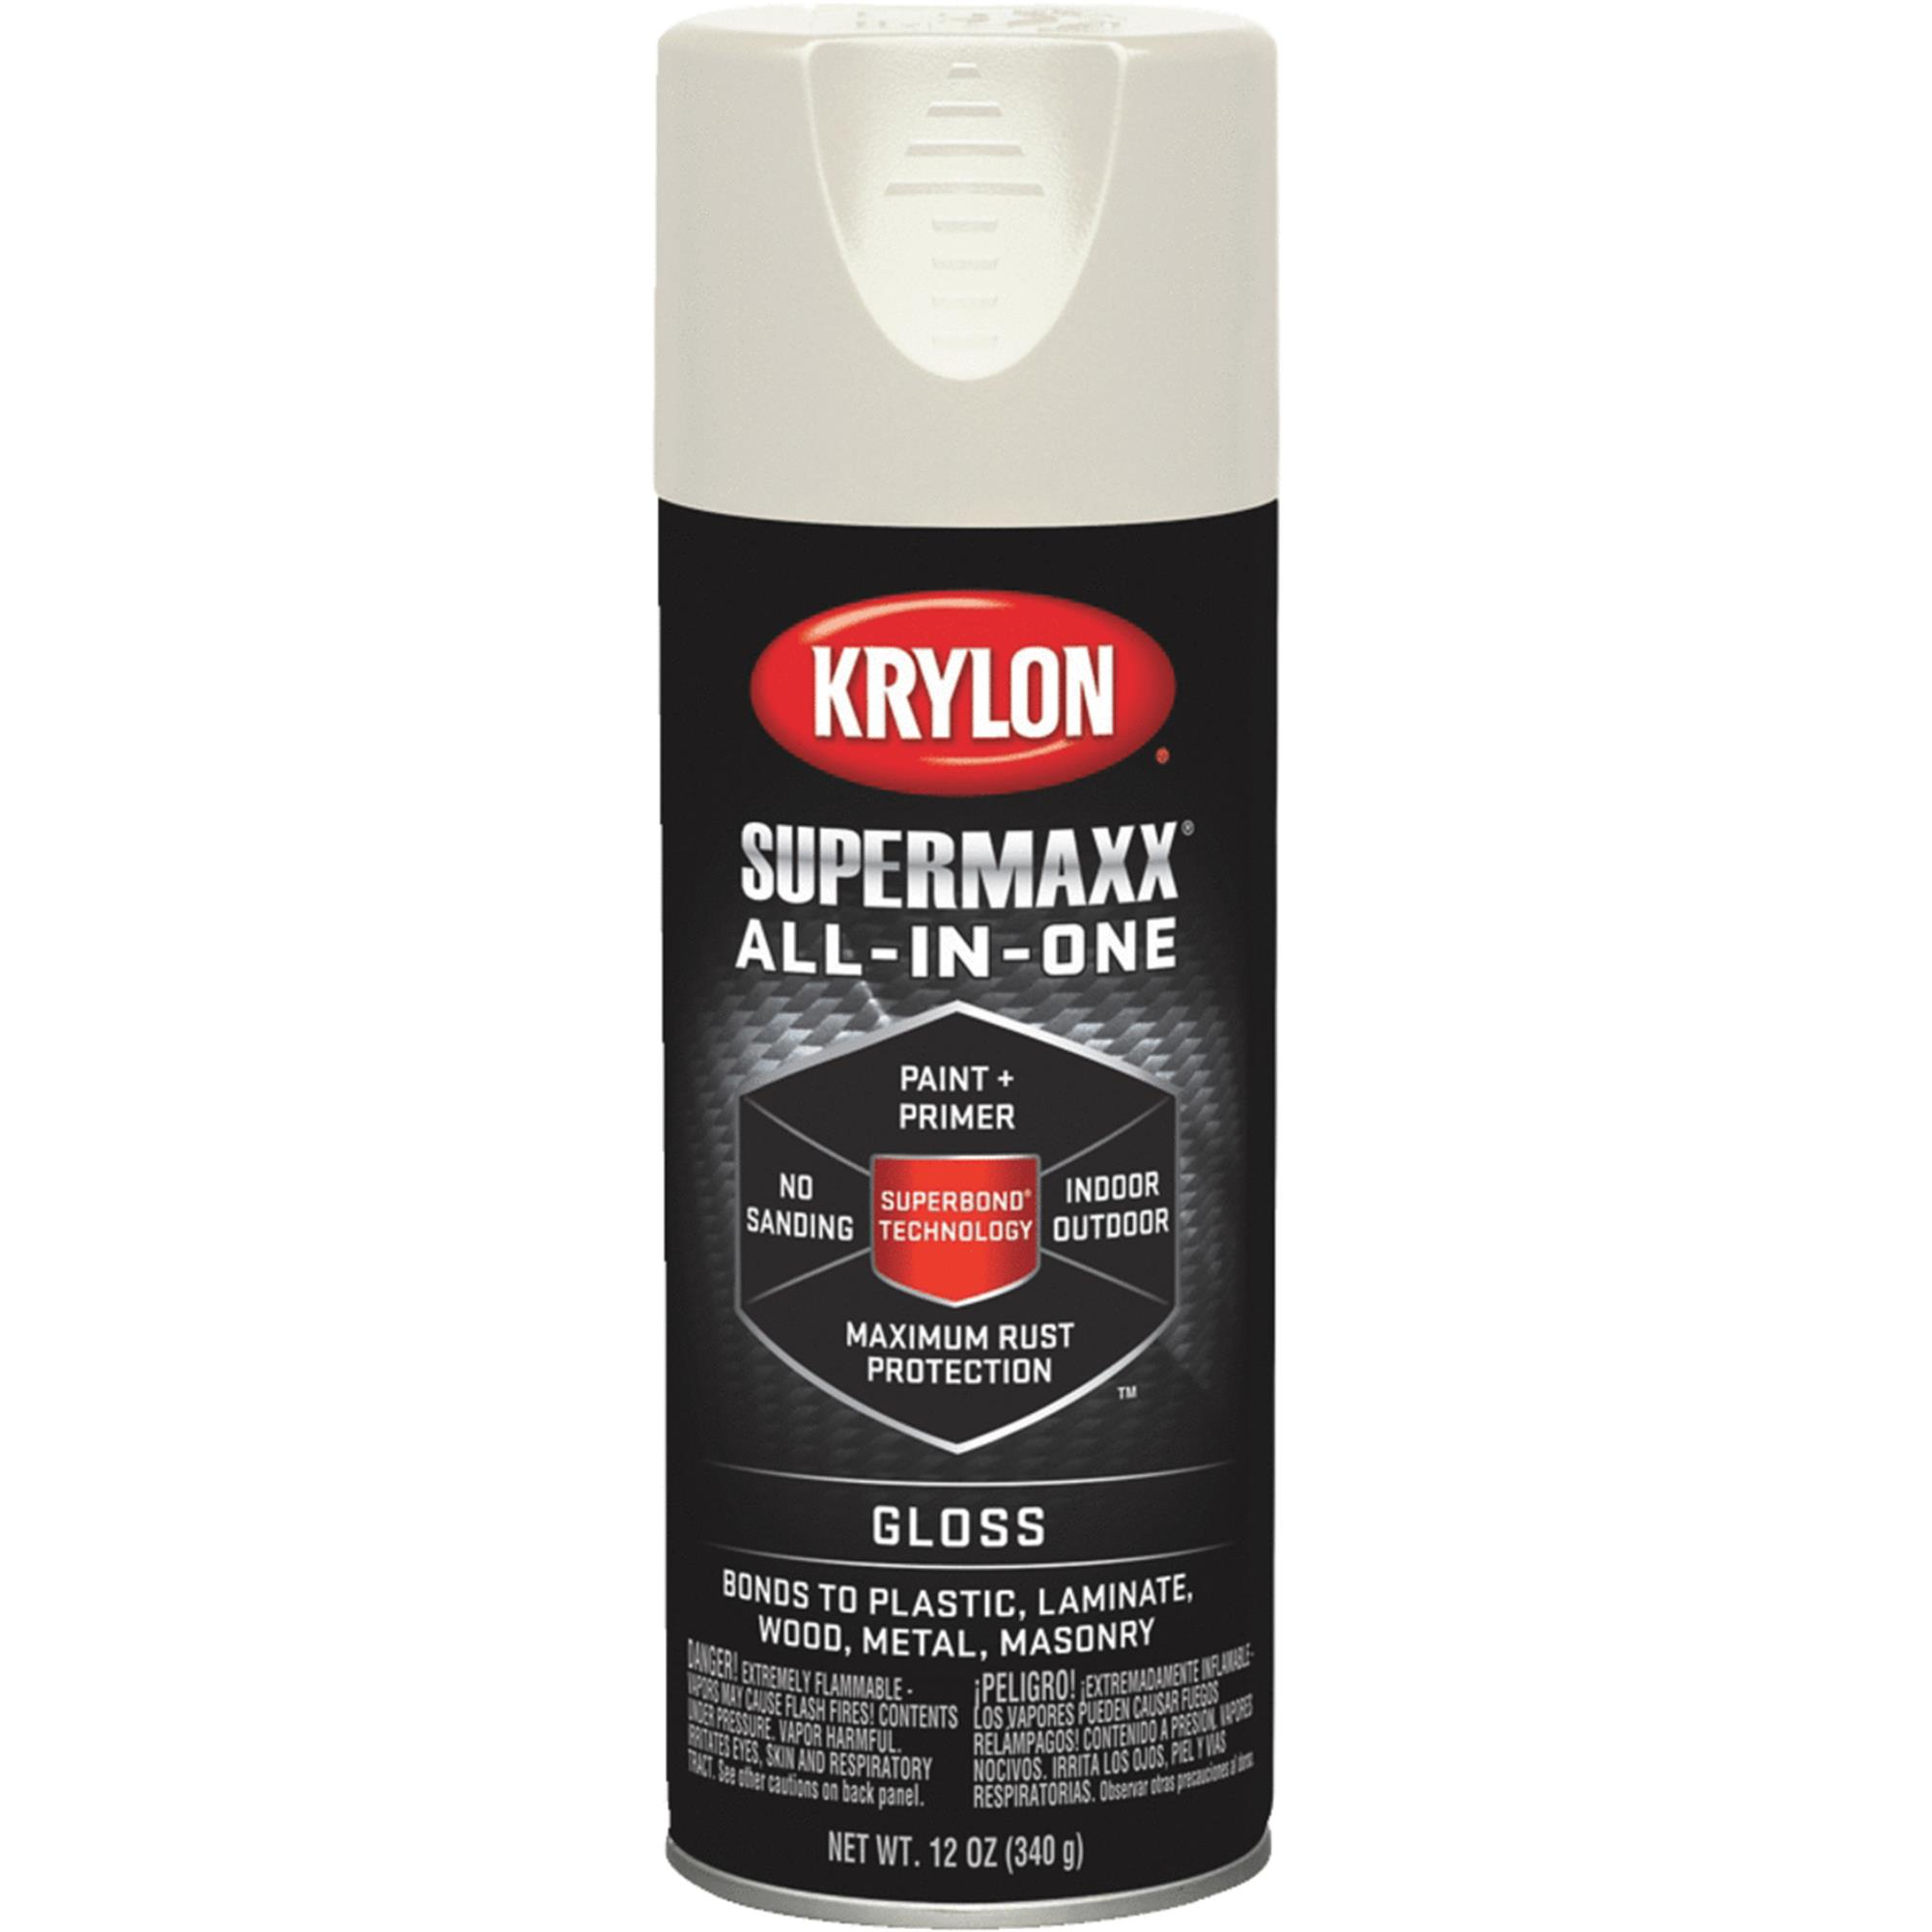 Krylon SUPERMAXX All-In-One Spray Paint